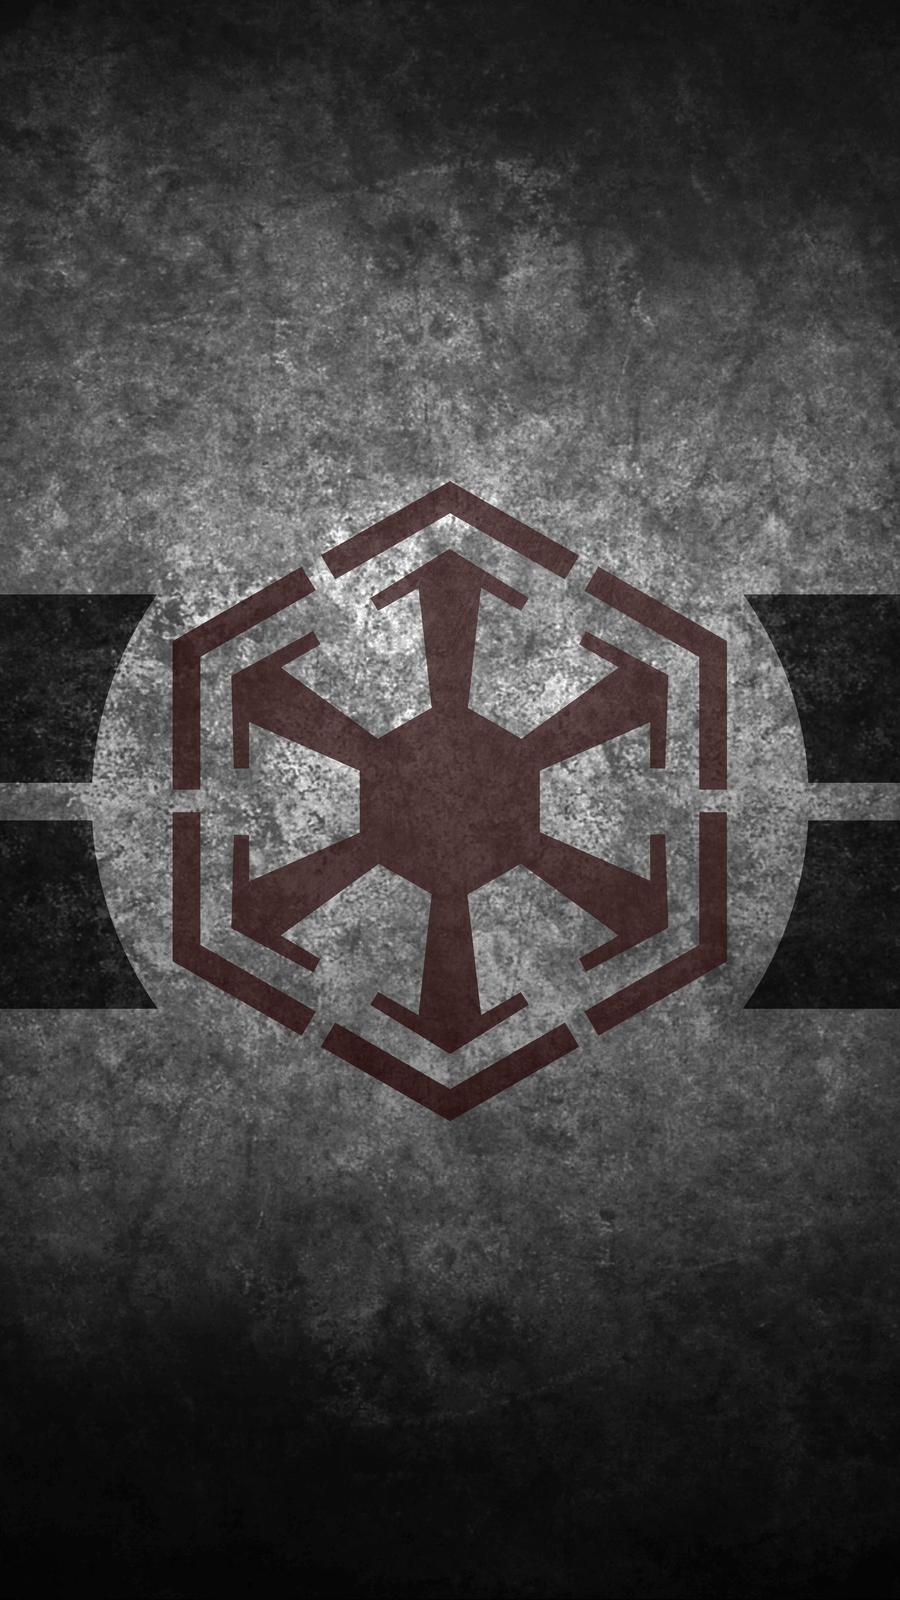 Star Wars Sith Symbol Wallpaper